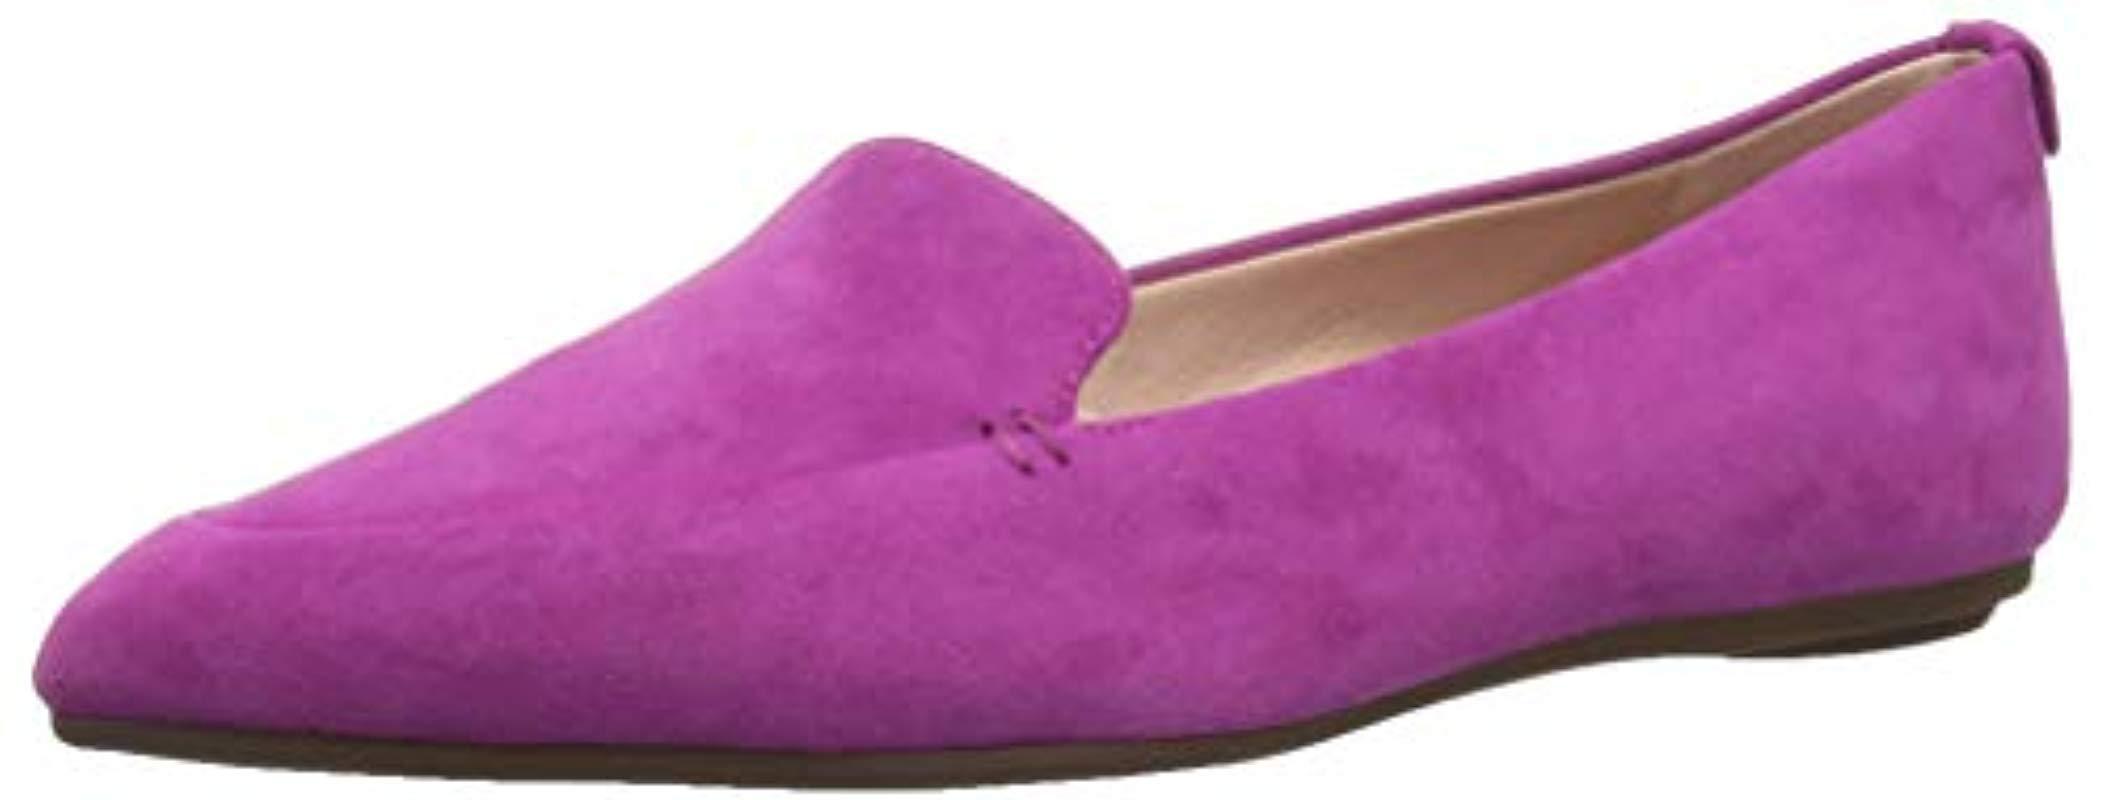 69ac2ab695b Lyst - Taryn Rose Faye Loafer Flat in Purple